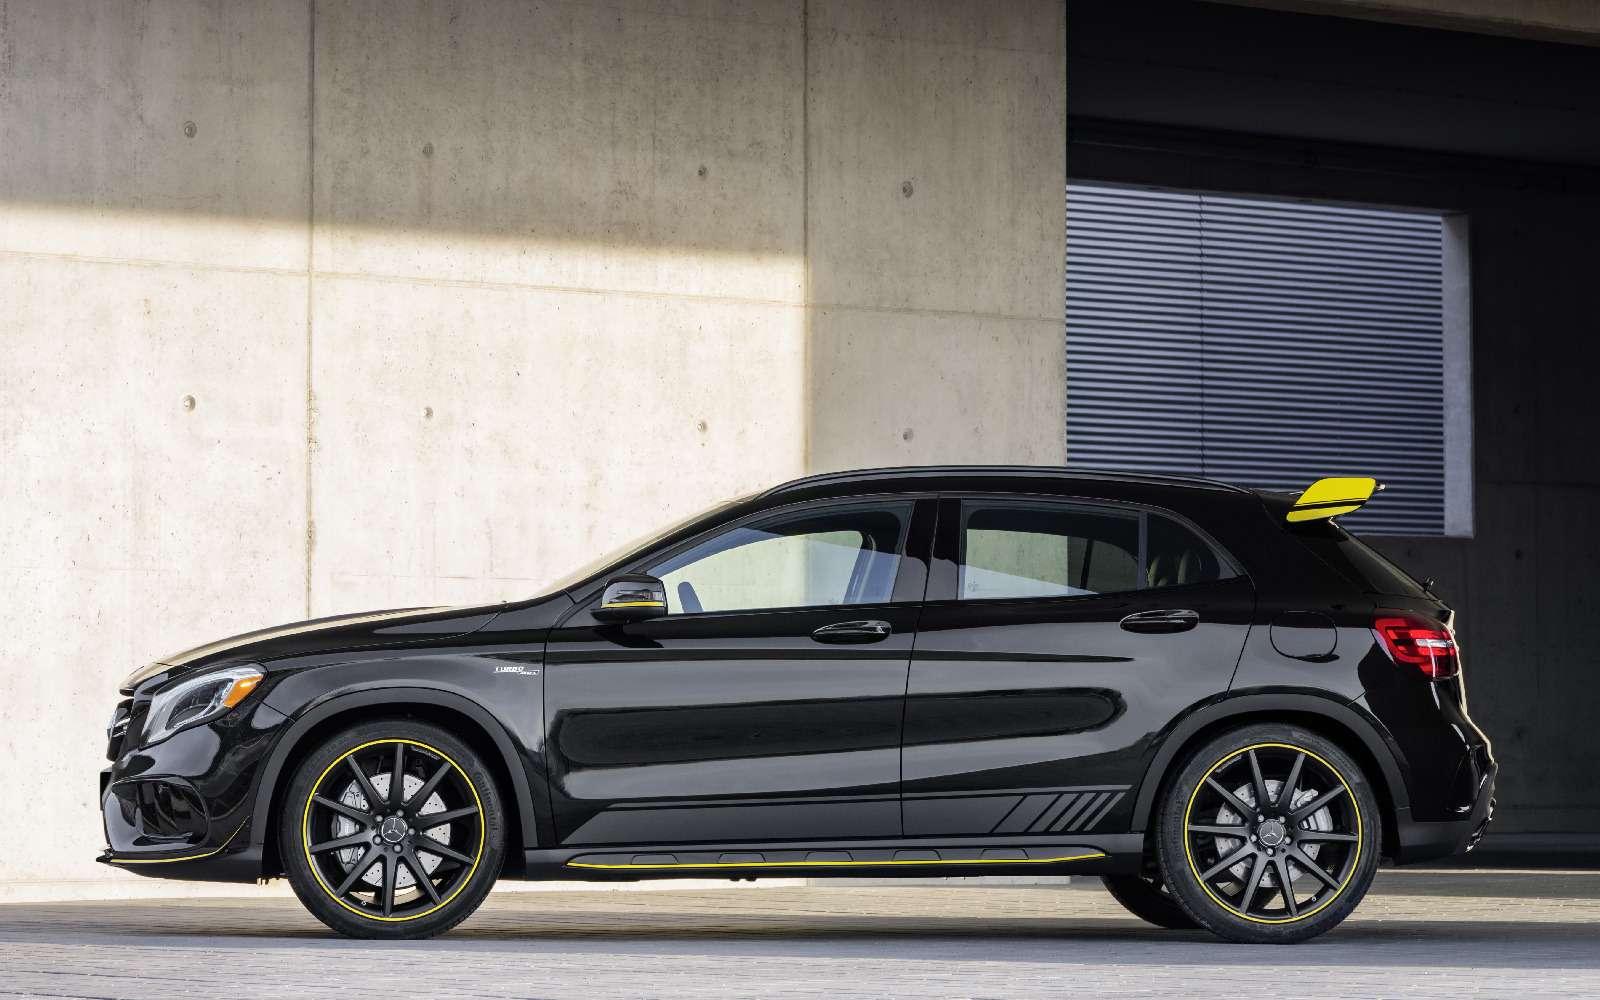 Mercedes-Benz GLA стал краше, нонепросторнее— фото 690078